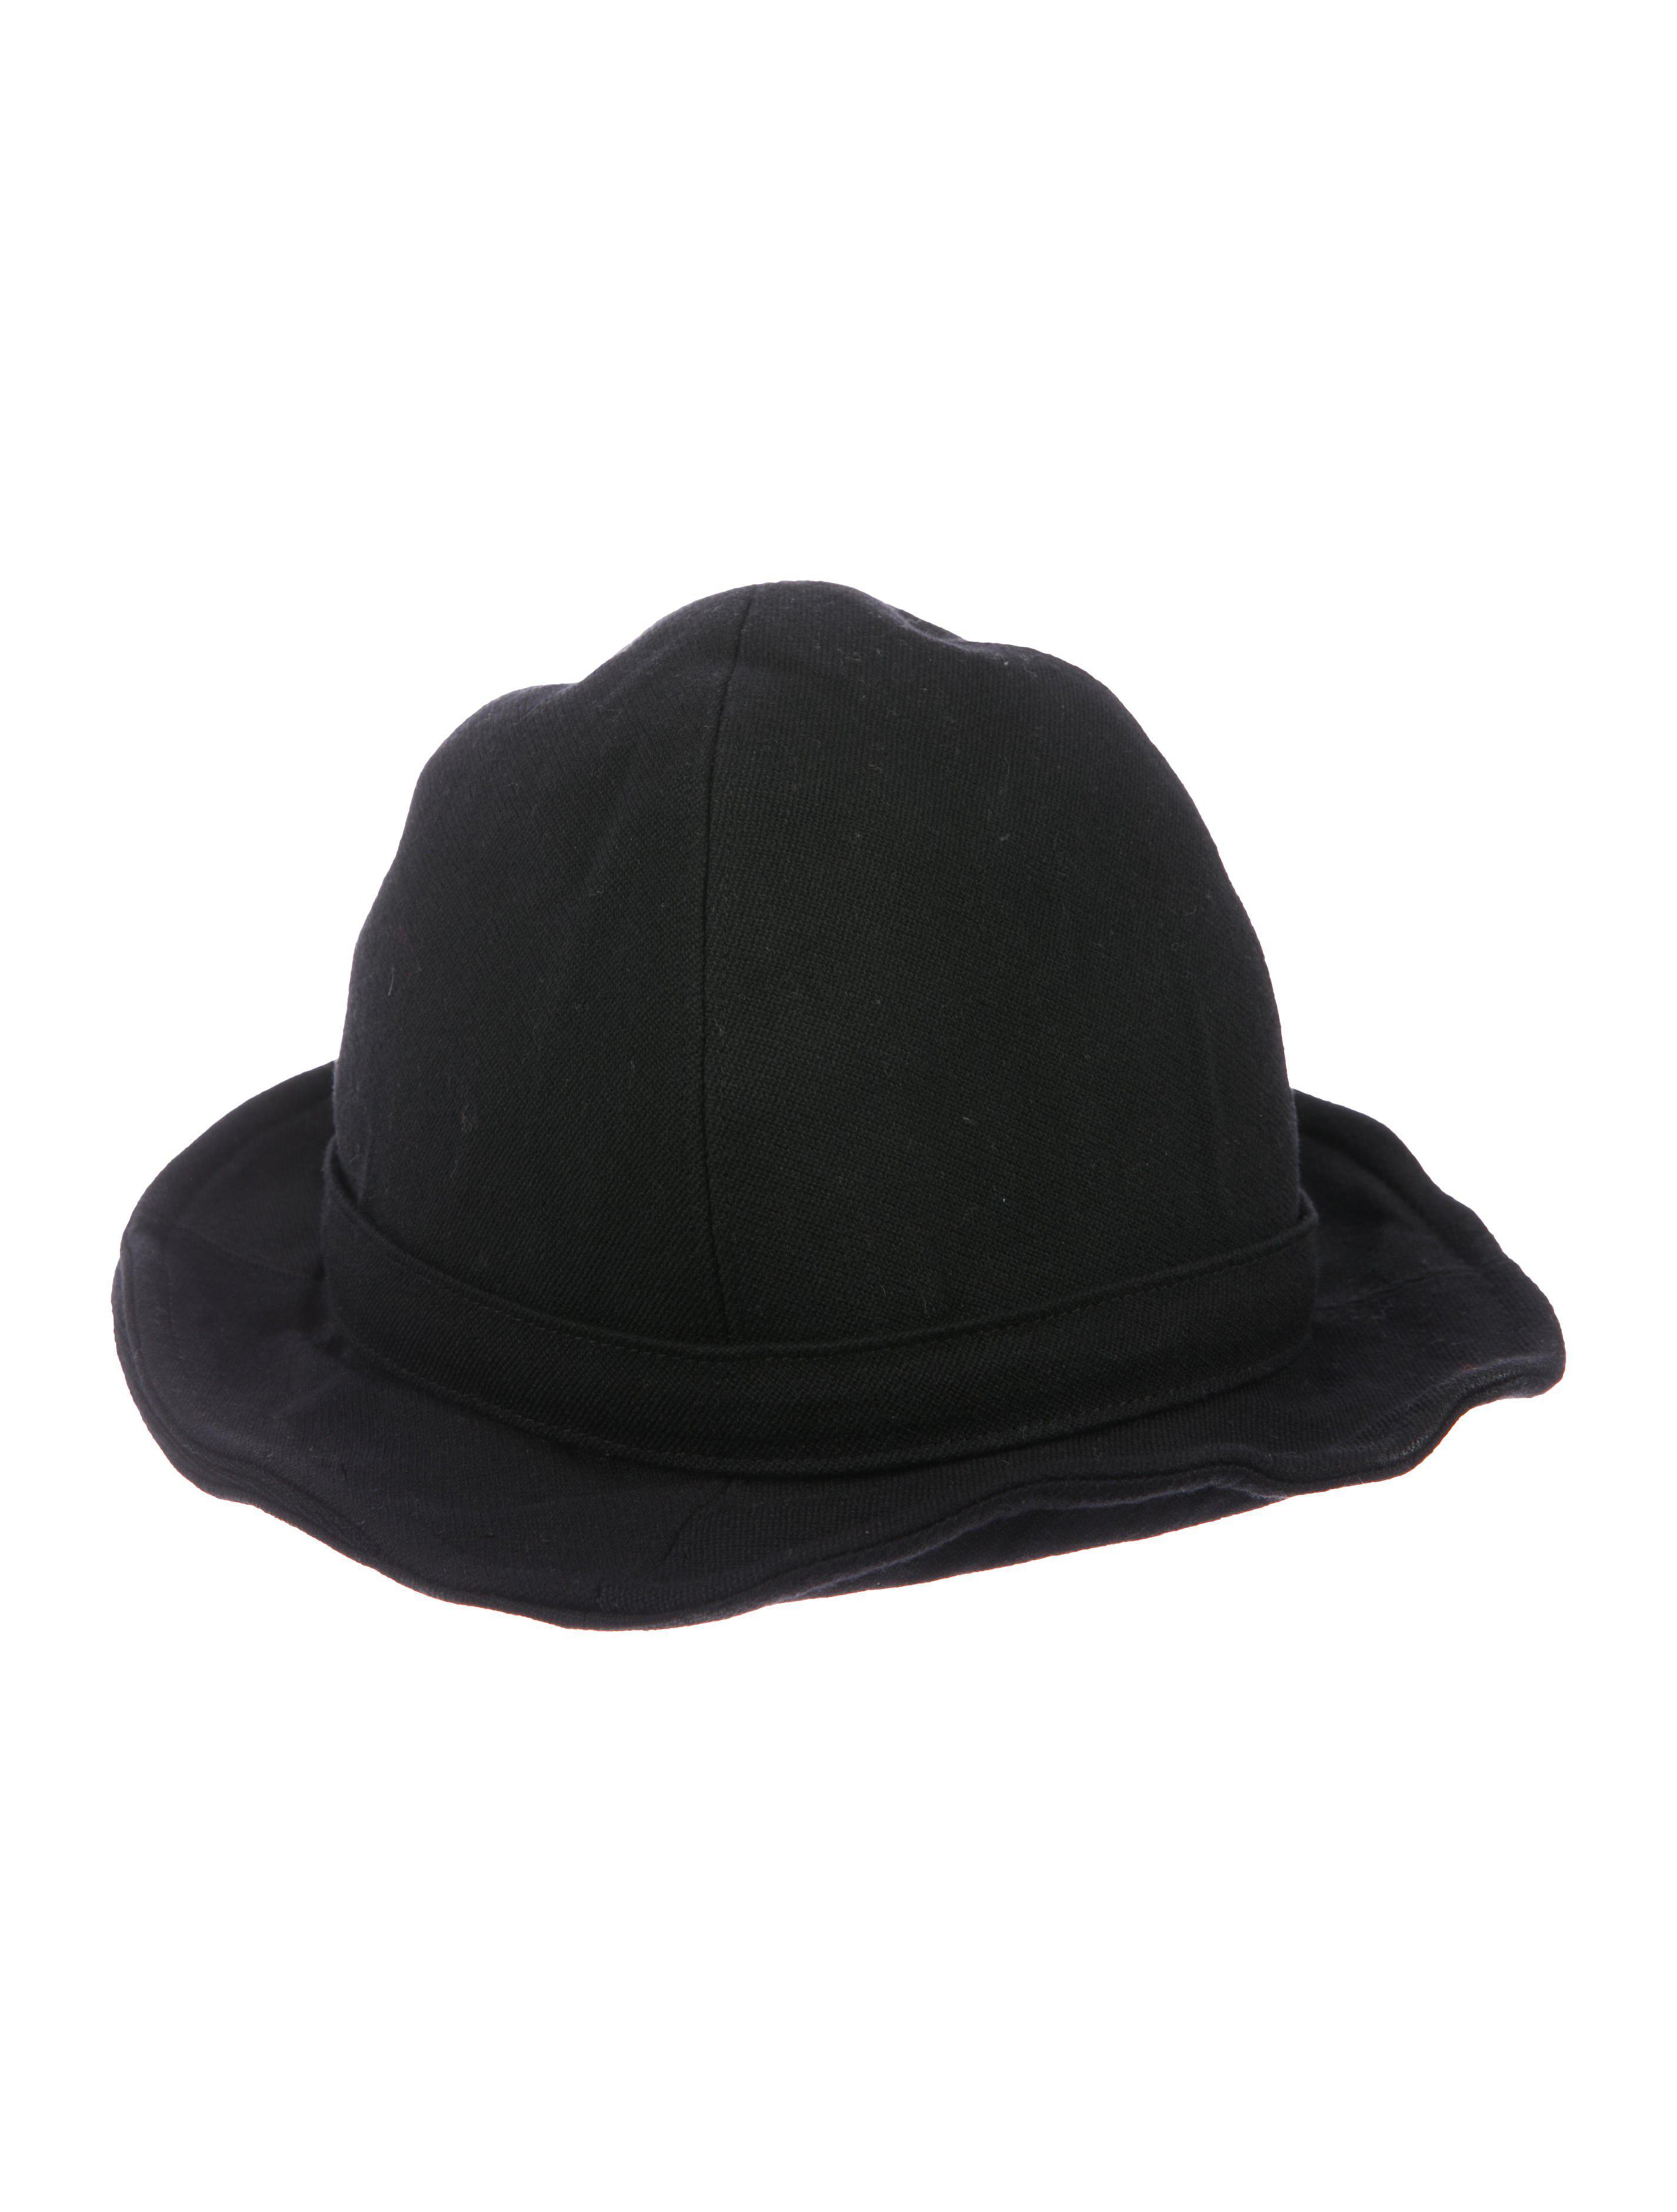 7c3e6ba44b5 Lyst - Y S Yohji Yamamoto Wool-blend Fedora Hat in Black for Men